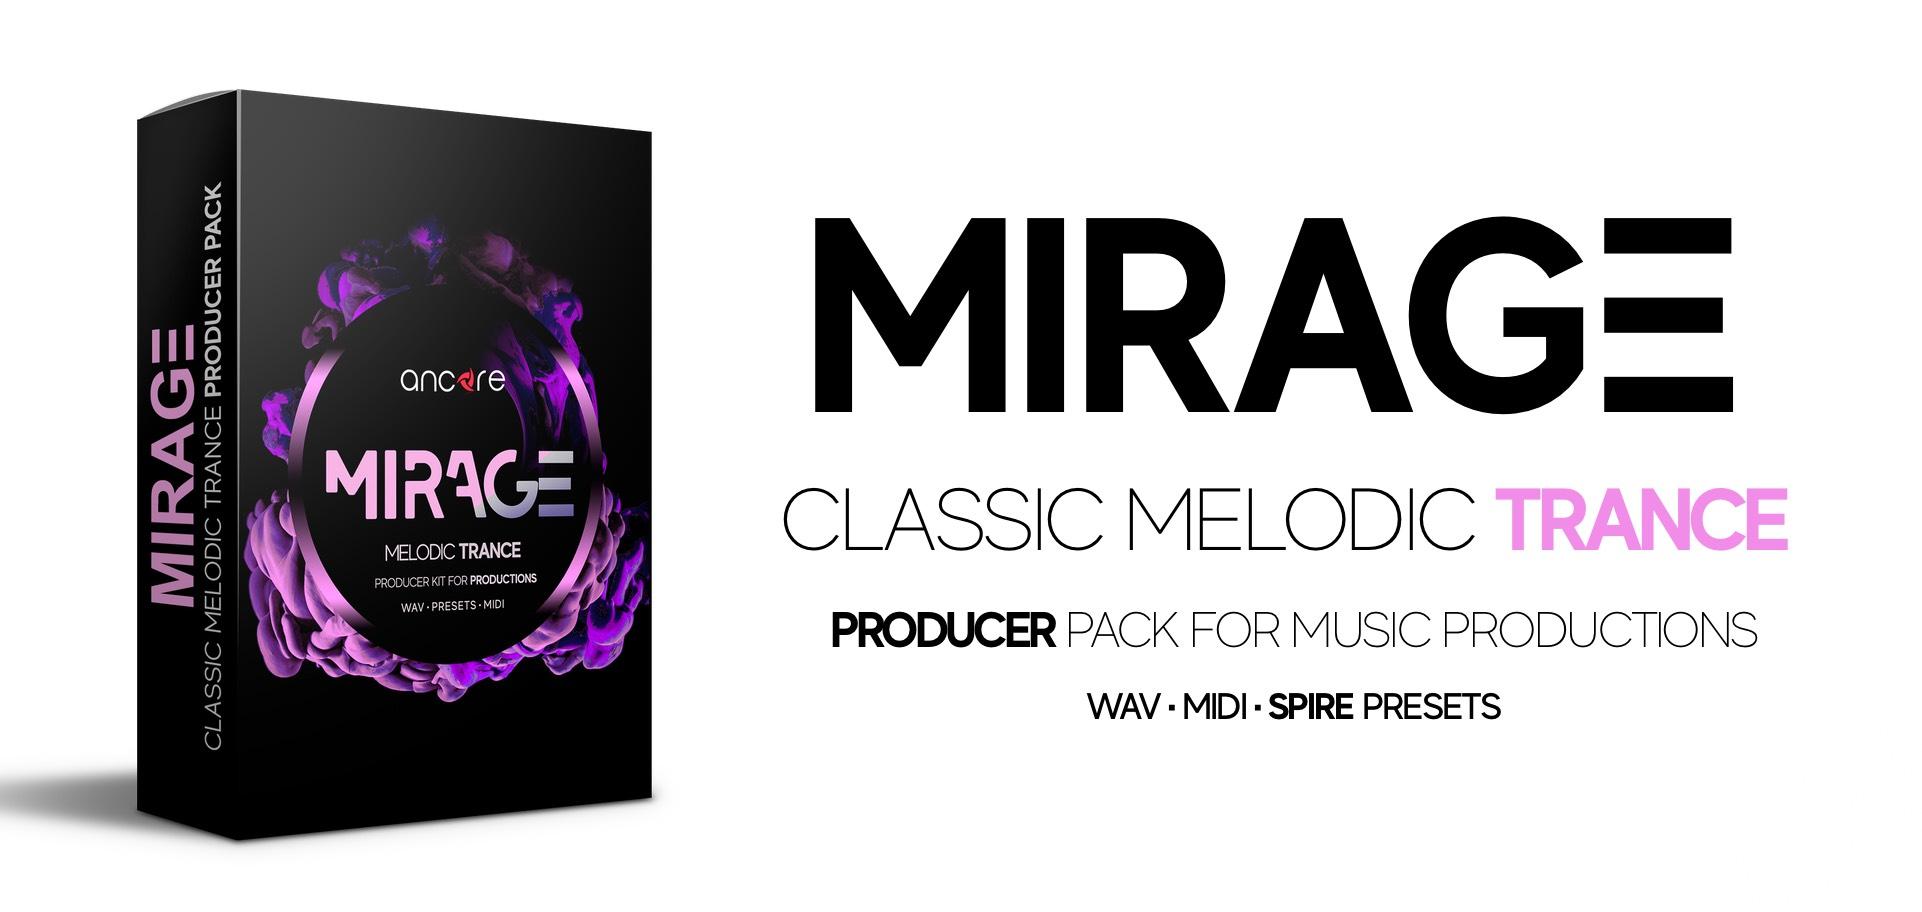 Mirage pack